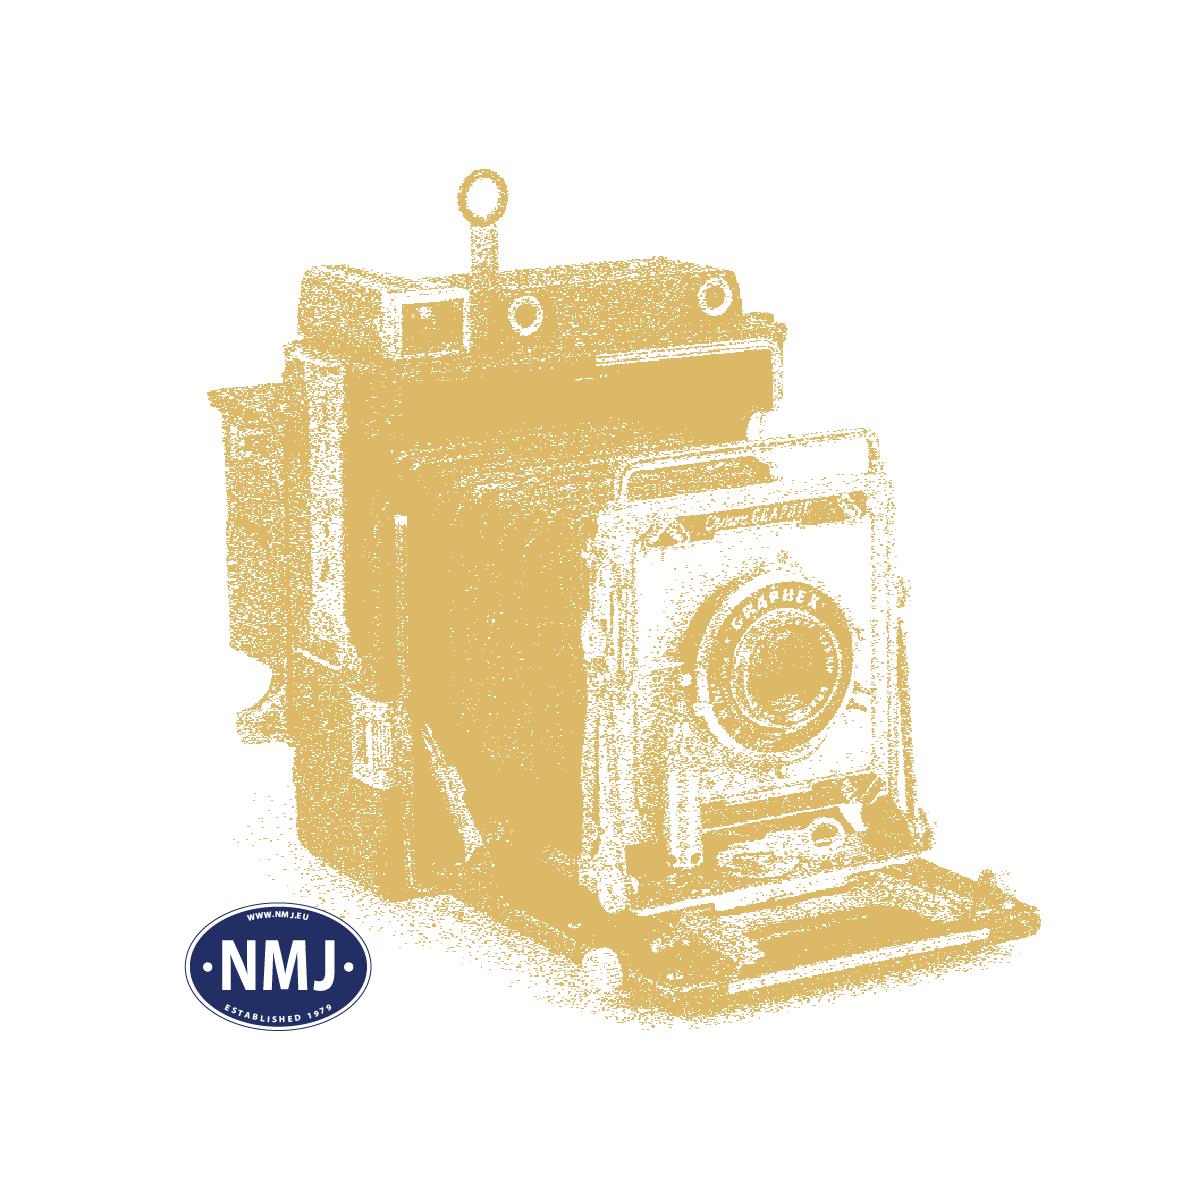 MWB-M005 - Grasmatte, raue Wiese, Spätsommer, 30 x 21 cm, für N - I